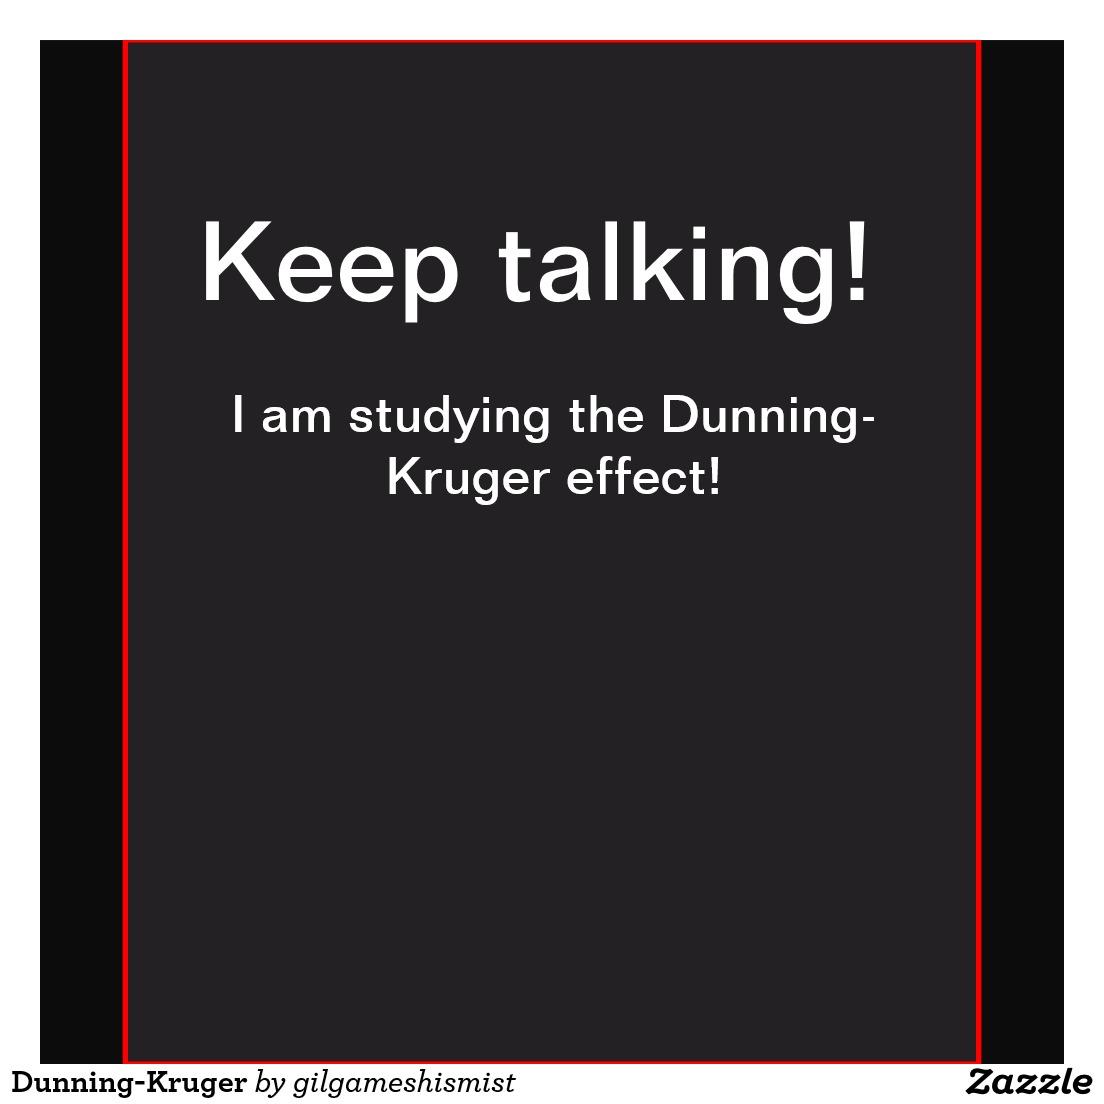 dunning_kruger_shirt-r3dd1260d923745cb8208a055f2ee462b_jgnkr_1024